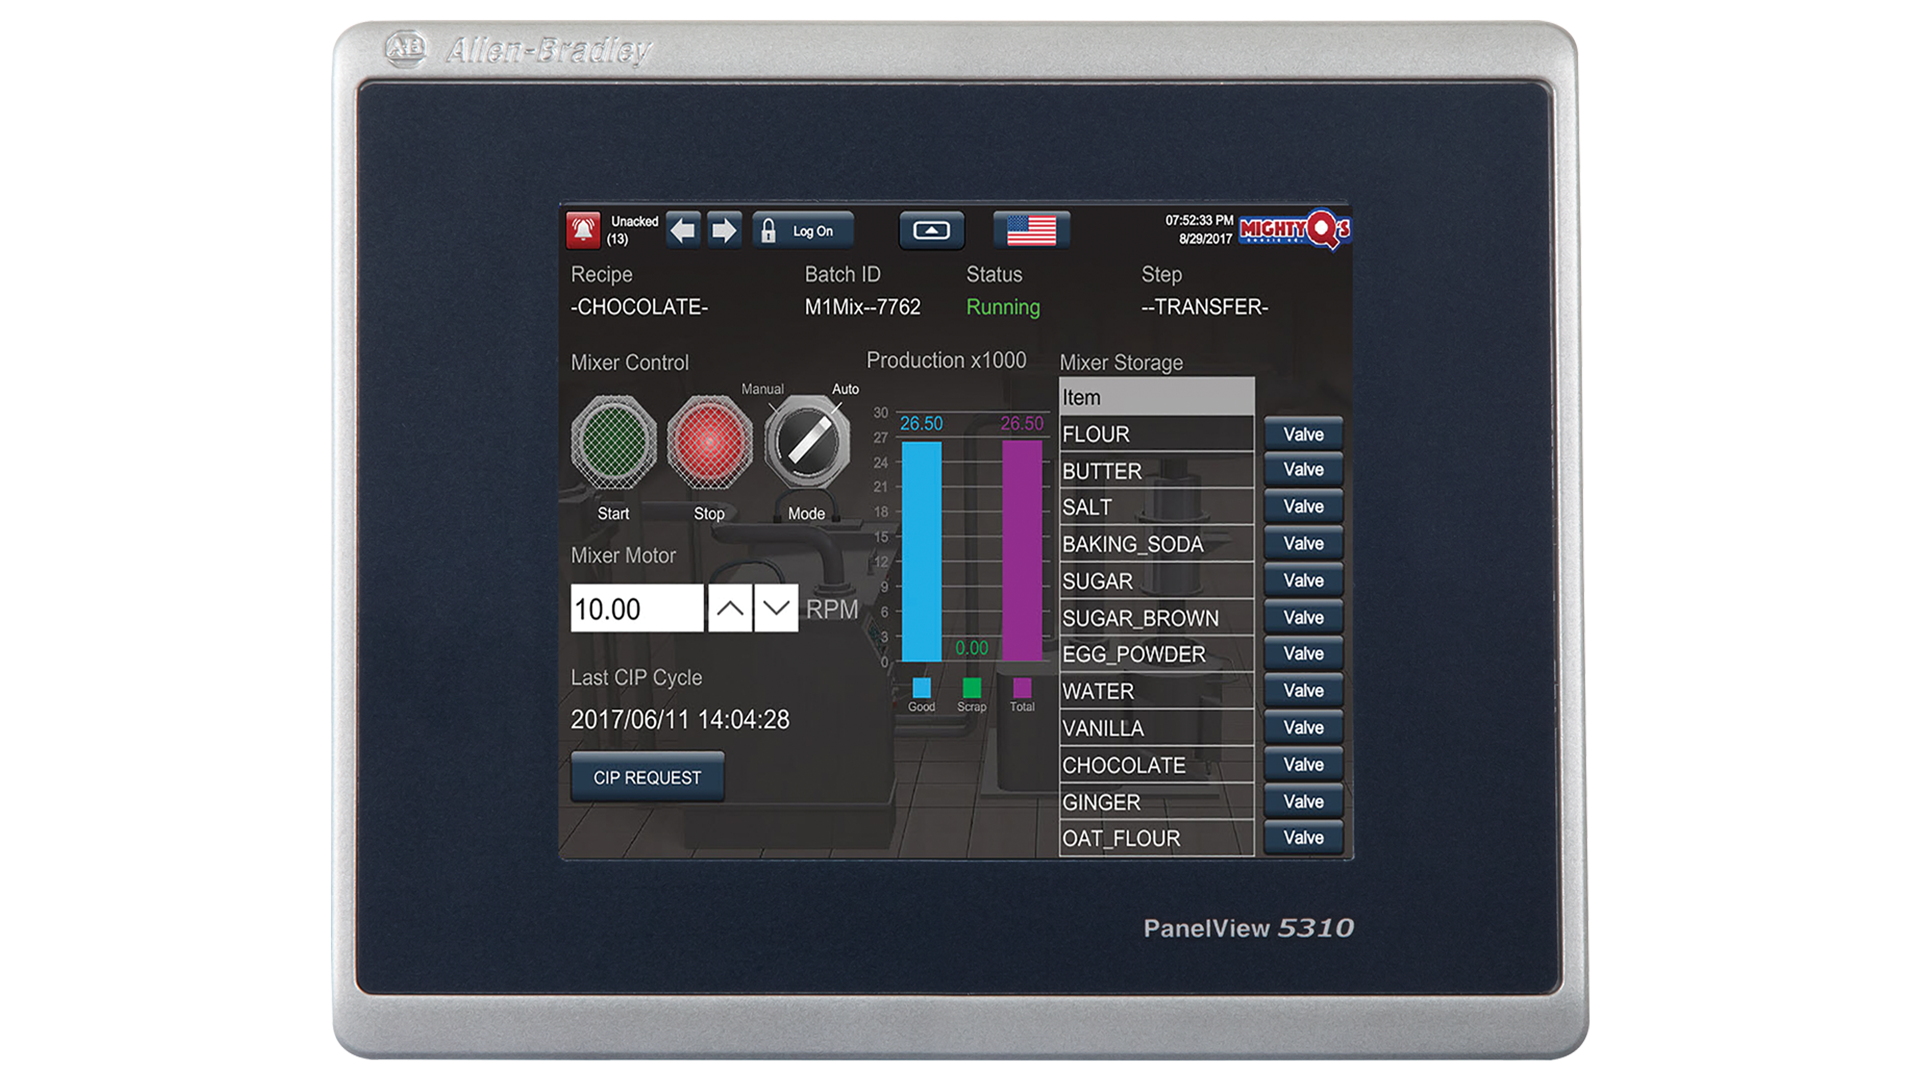 PanelView-5310 monitor